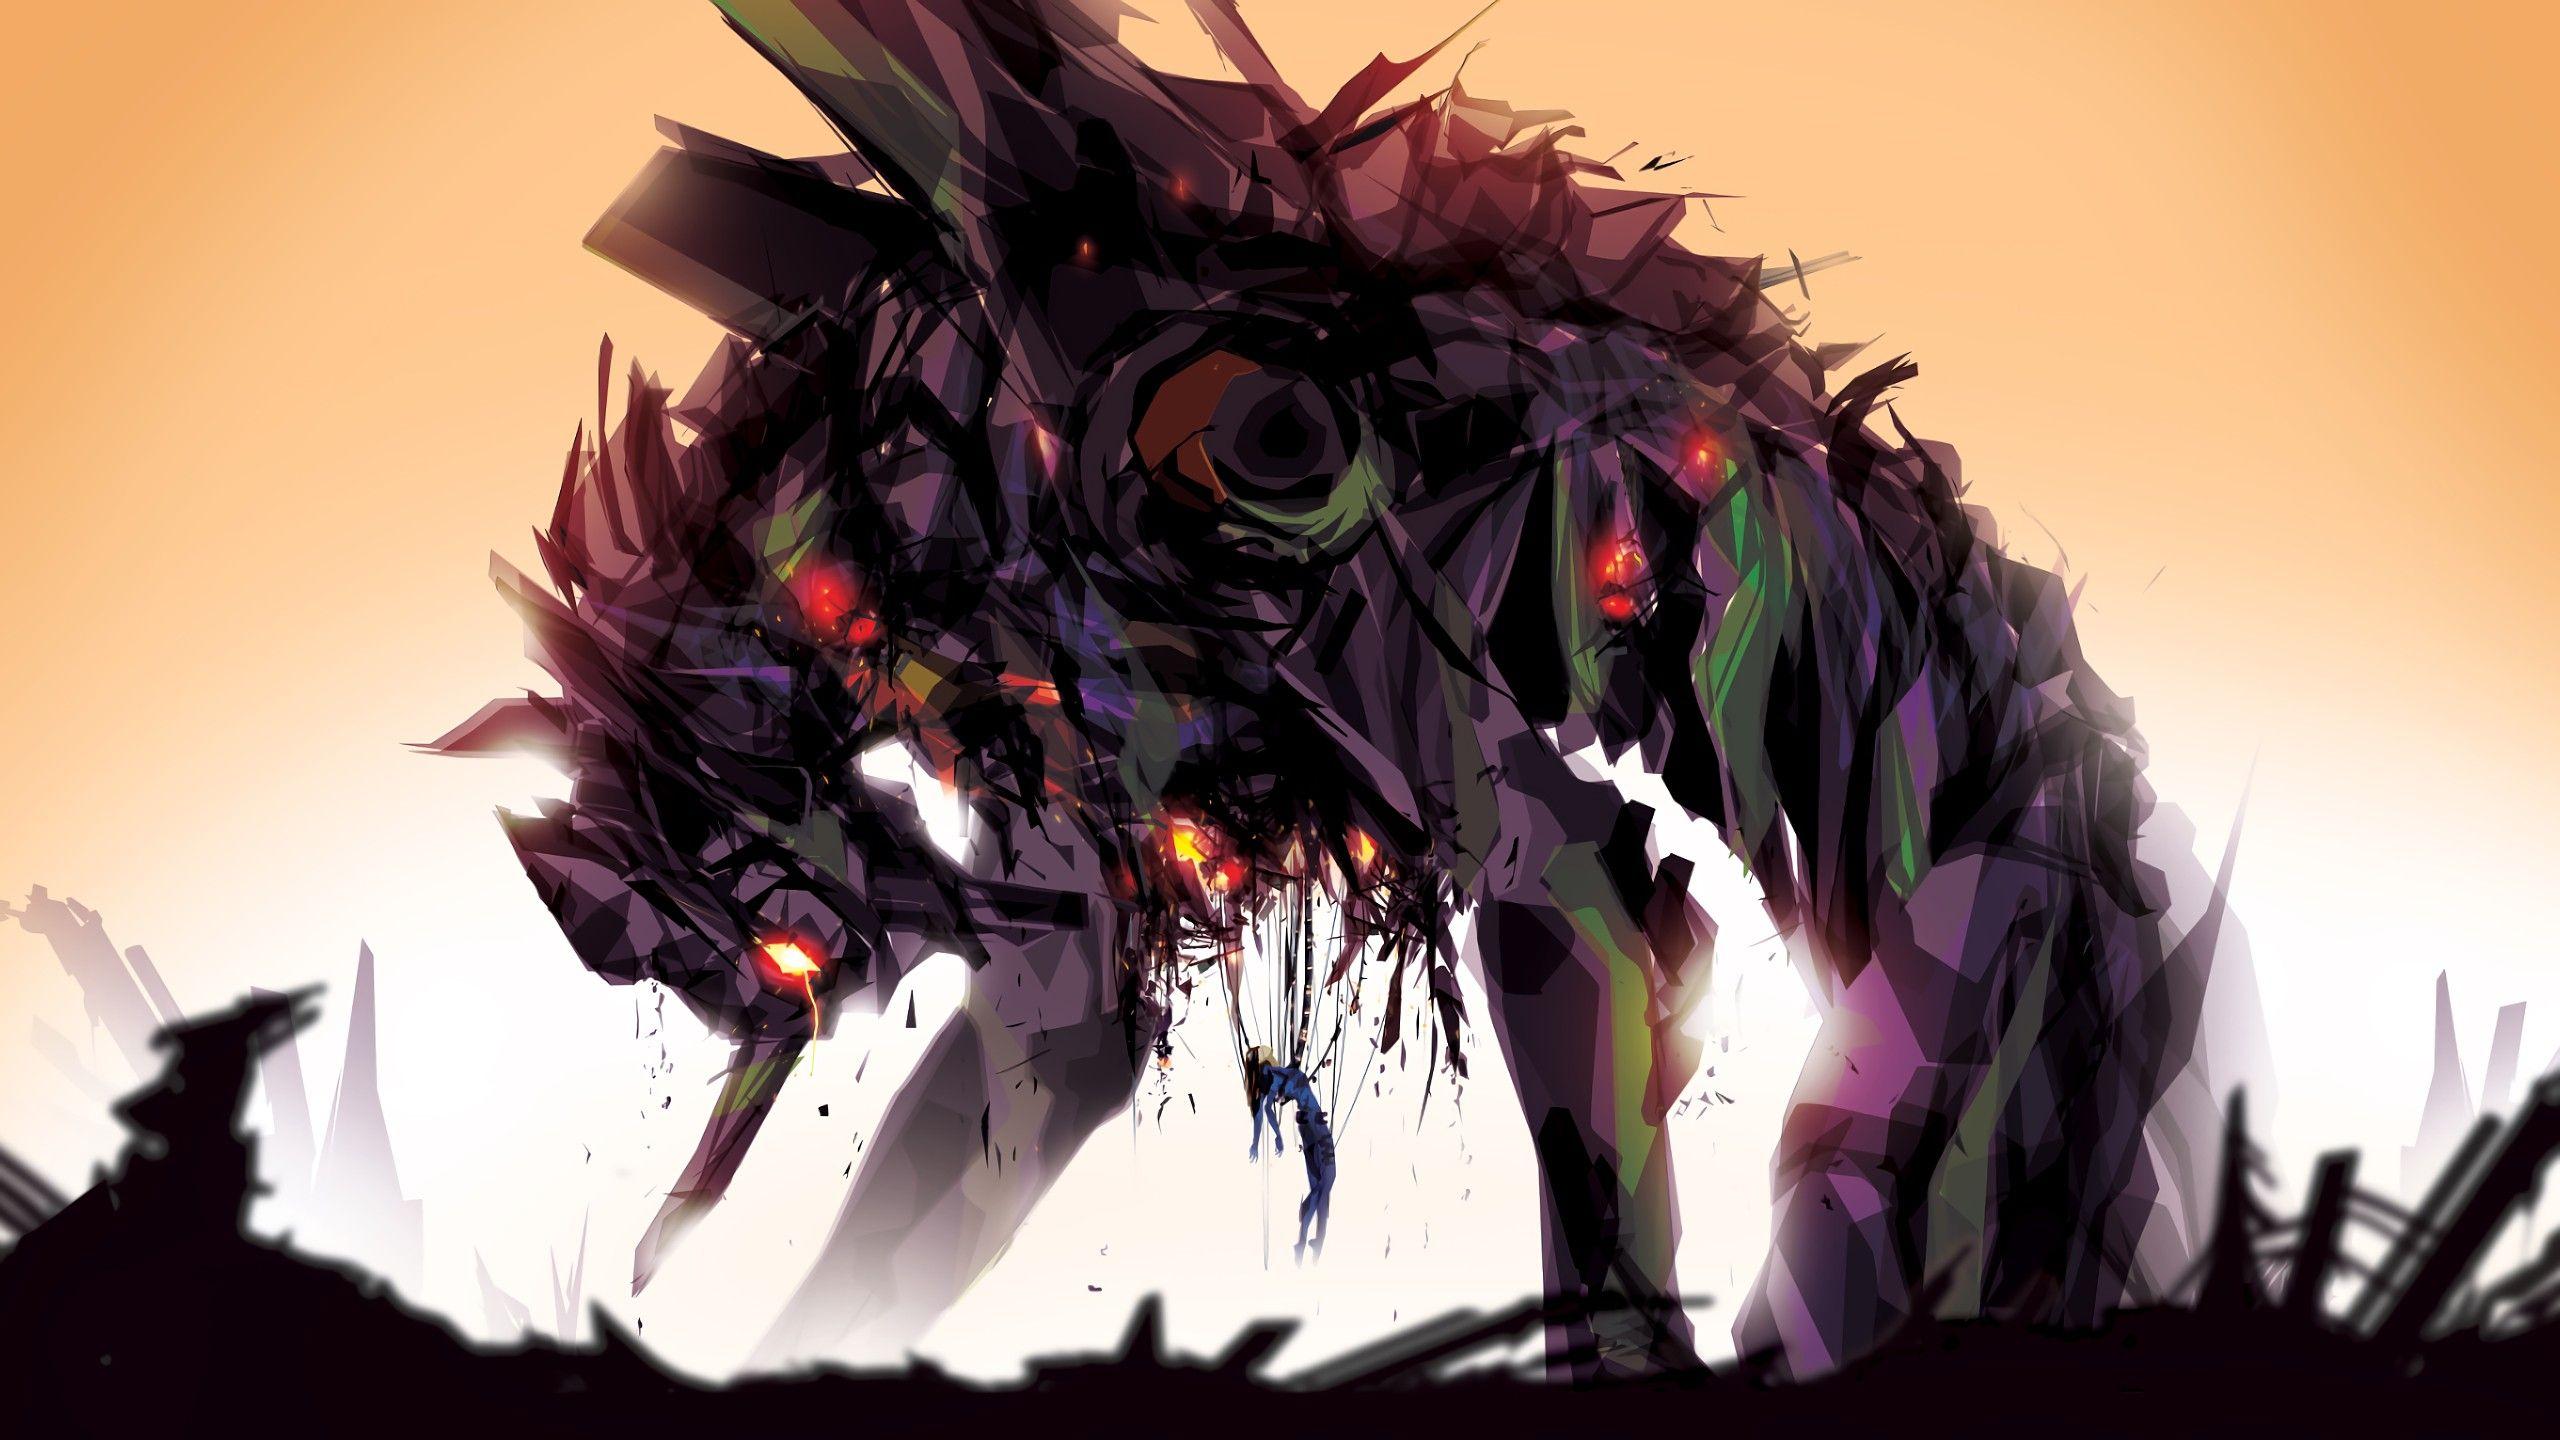 Anime 2560x1440 Neon Genesis Evangelion mech EVA Unit 01